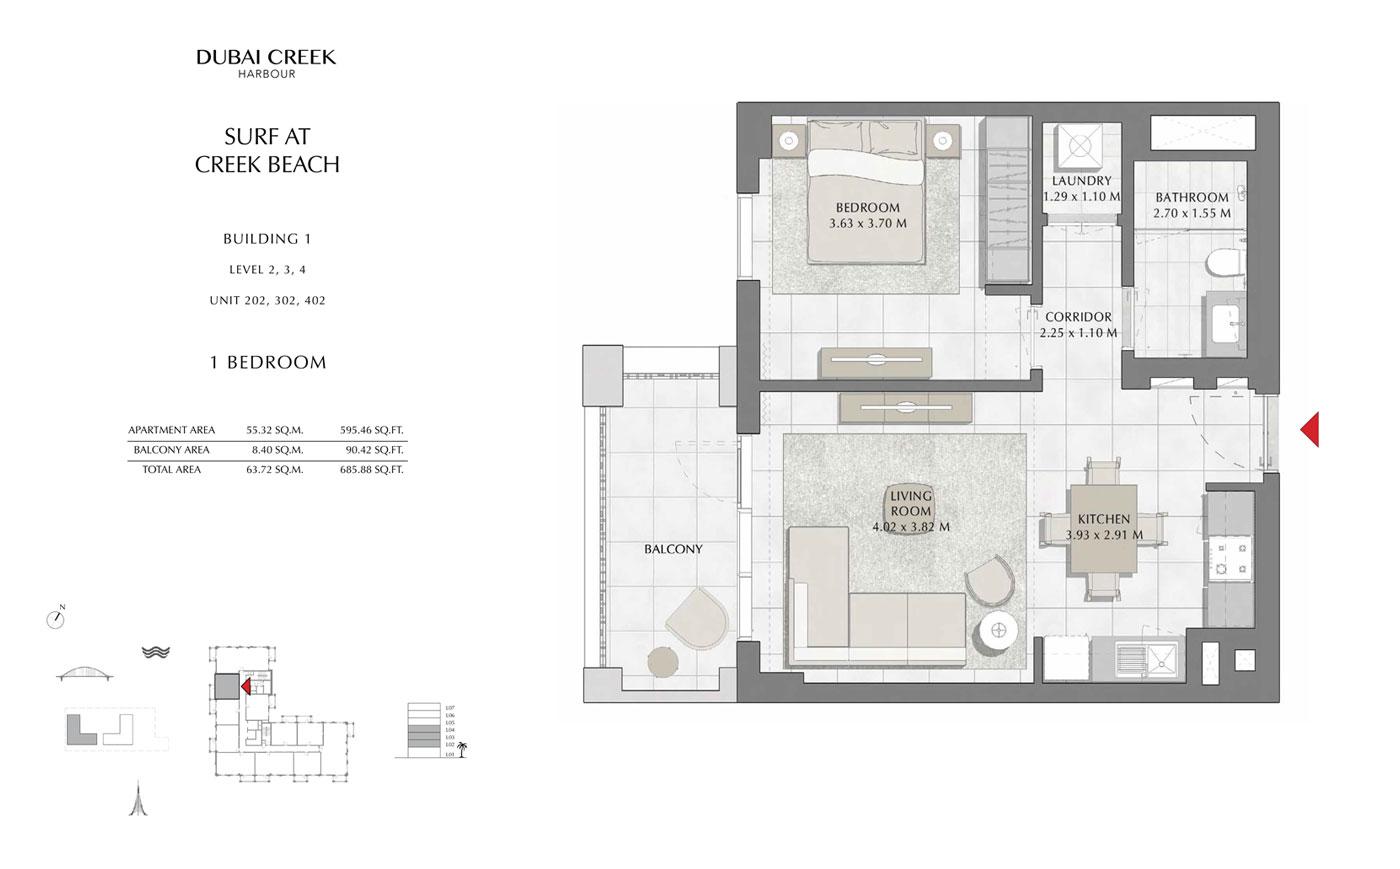 Building-1-1-Bedroom, Level-2-3-4,-Unit-202-302-402,-Size-685 sq.ft